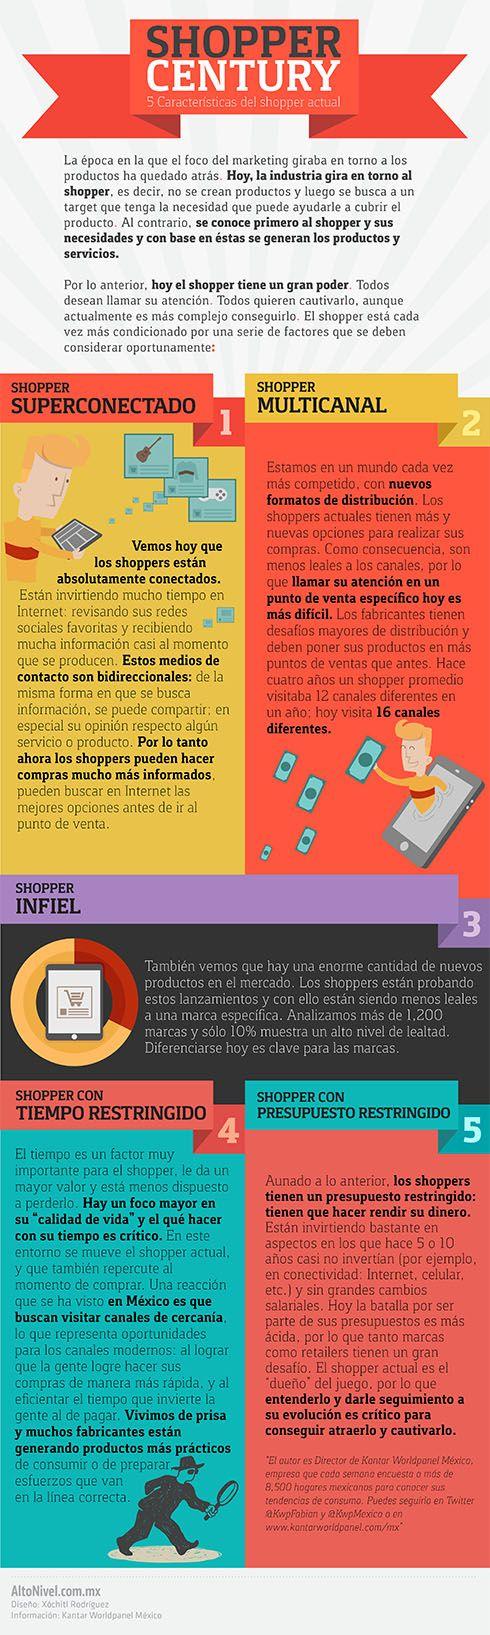 infografia_5_caracteristicas_de_consumidor_actual.jpg (490×1635)